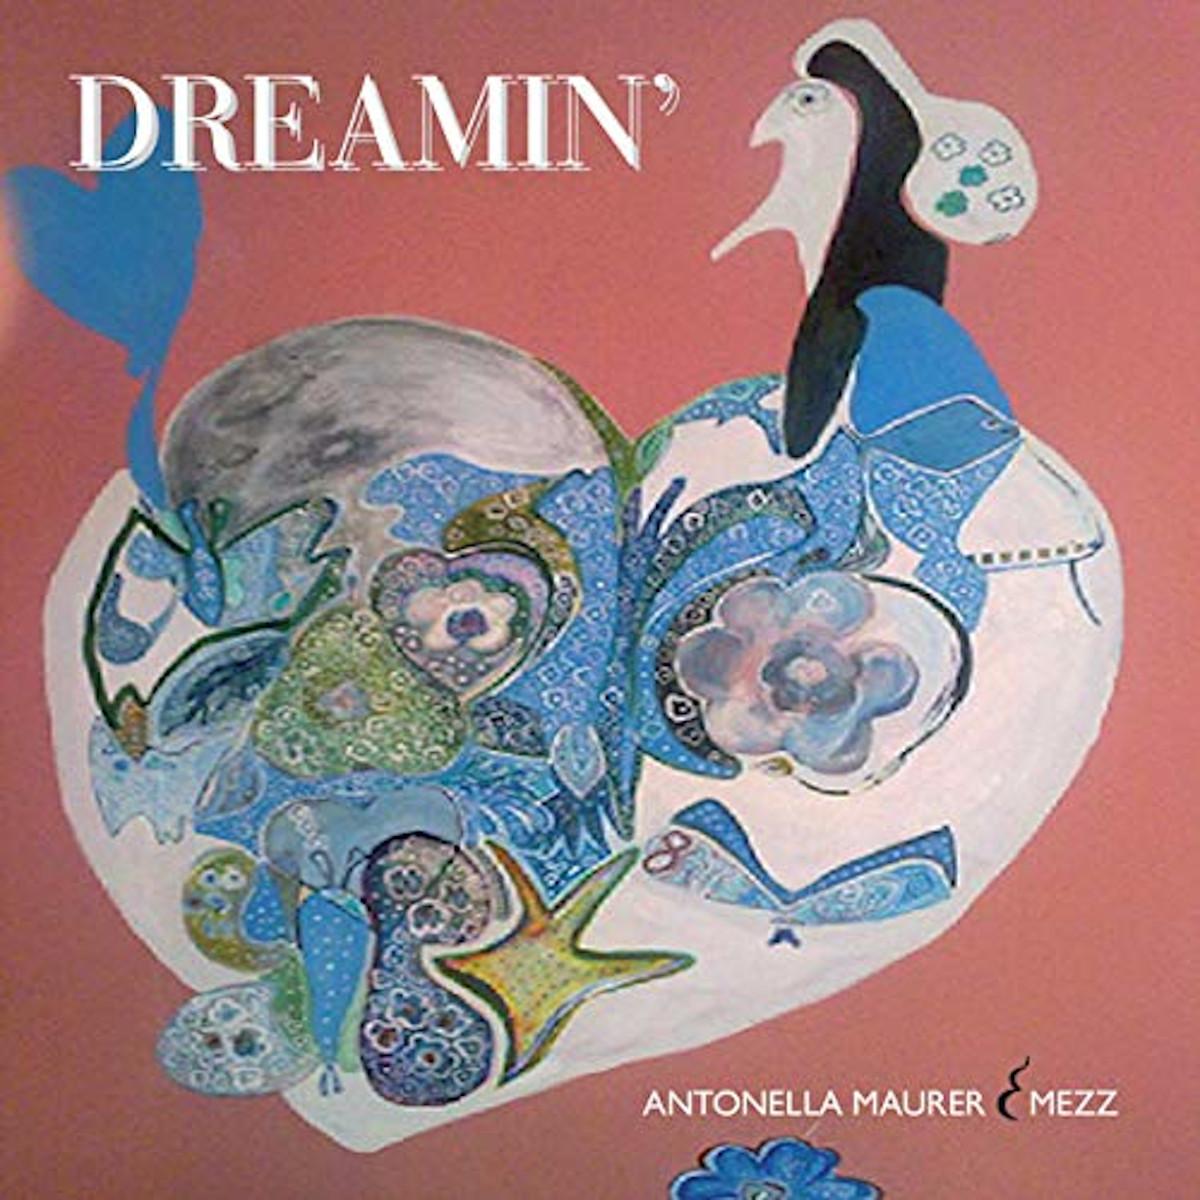 Antonella Maurer & Mezz <br/> Dreamin' <br/> NBB, 2019